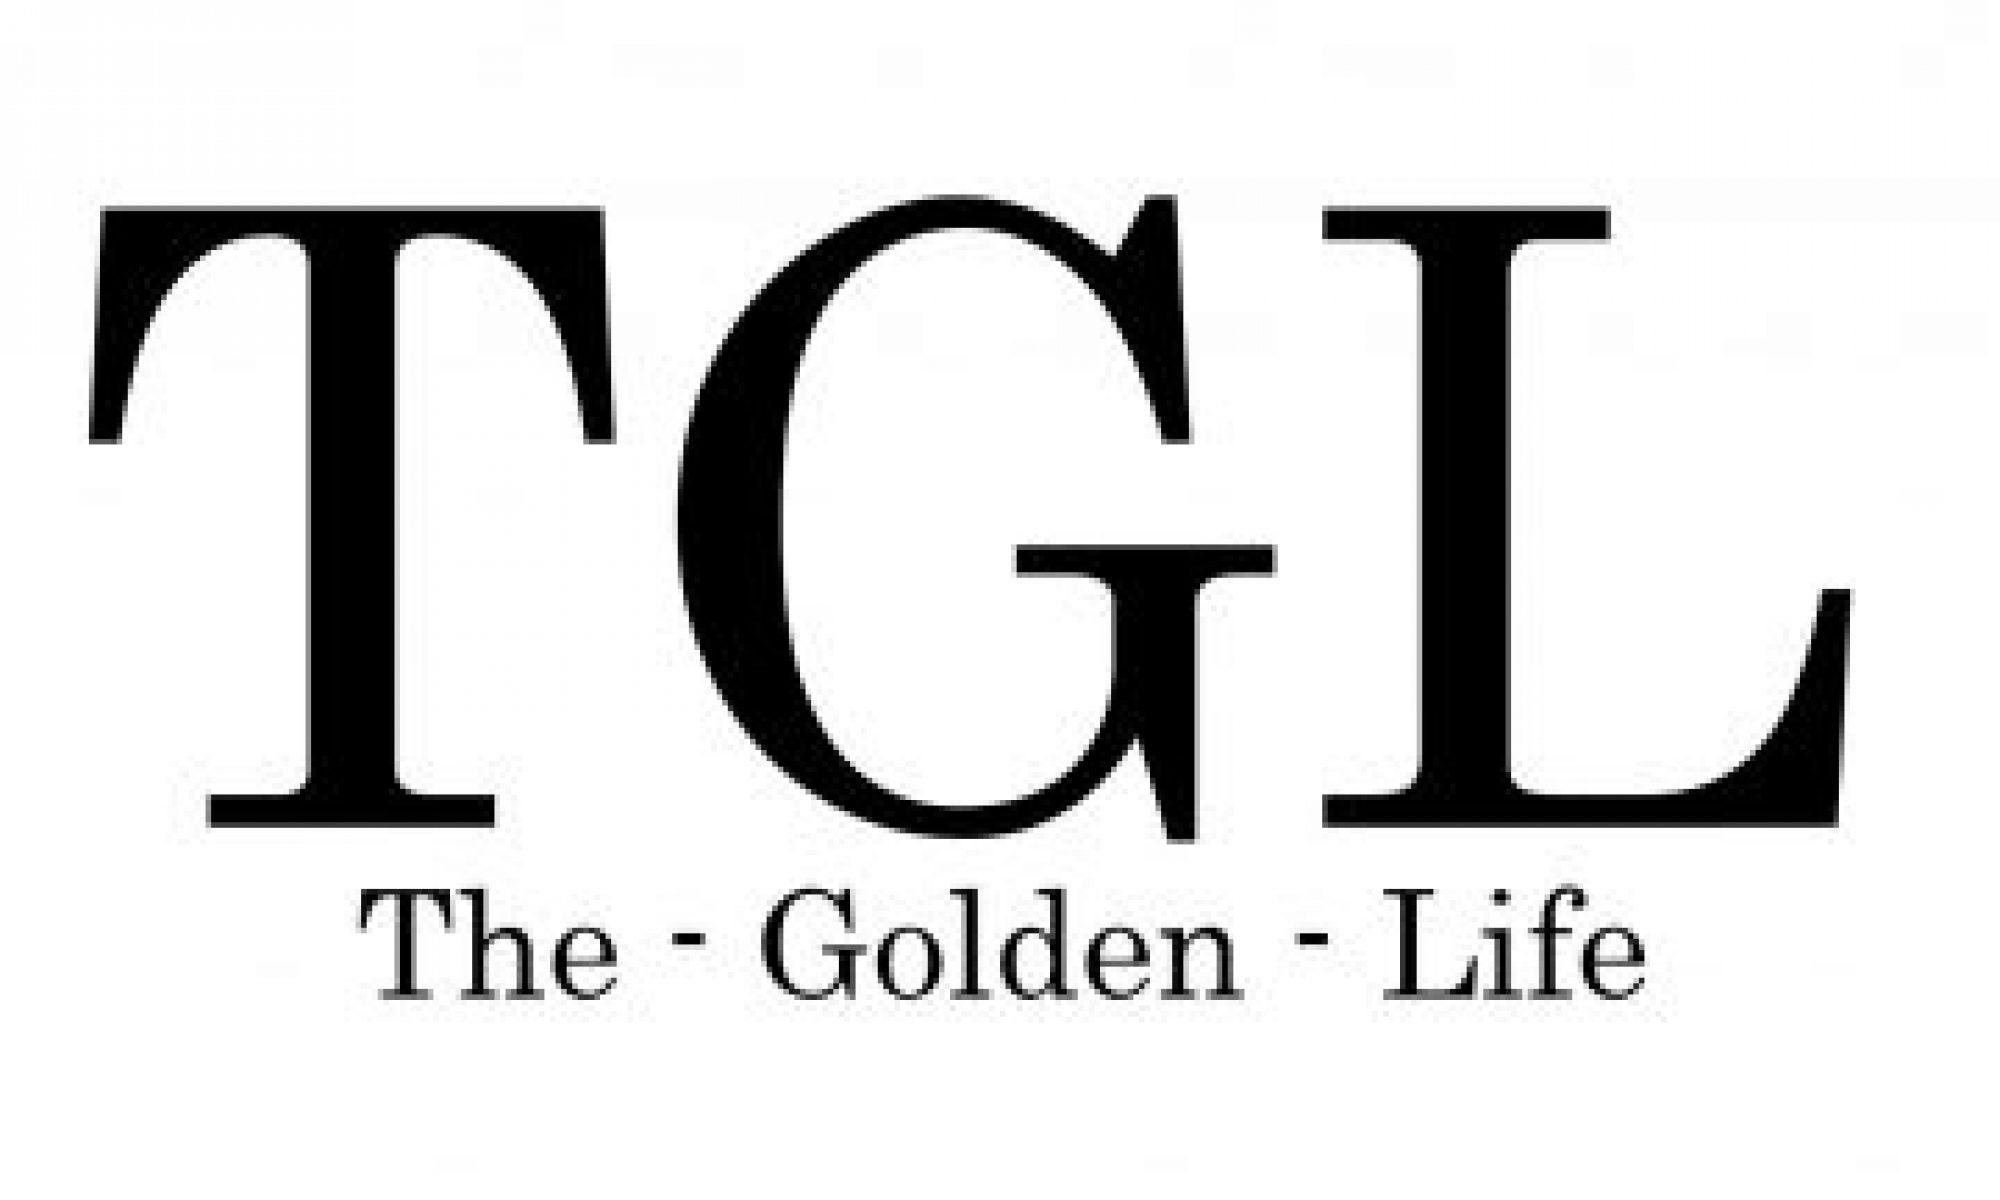 cropped-tgl-the-golden-life2-e15203029886022.jpg